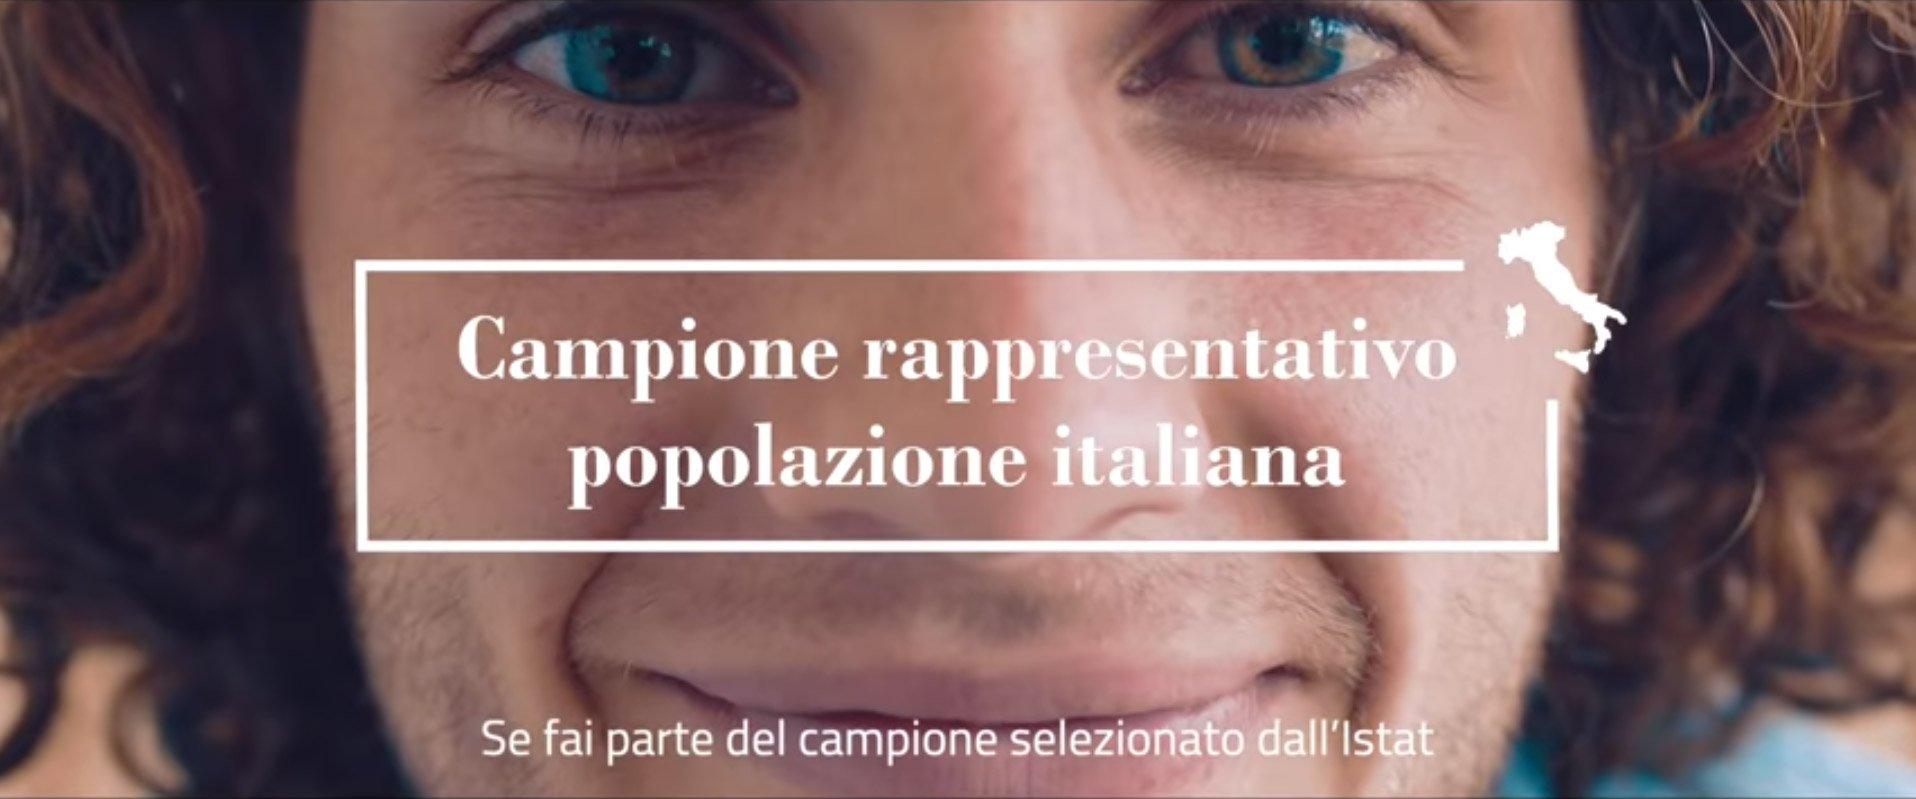 test sieroprevalenza covid19 croce rossa italiana